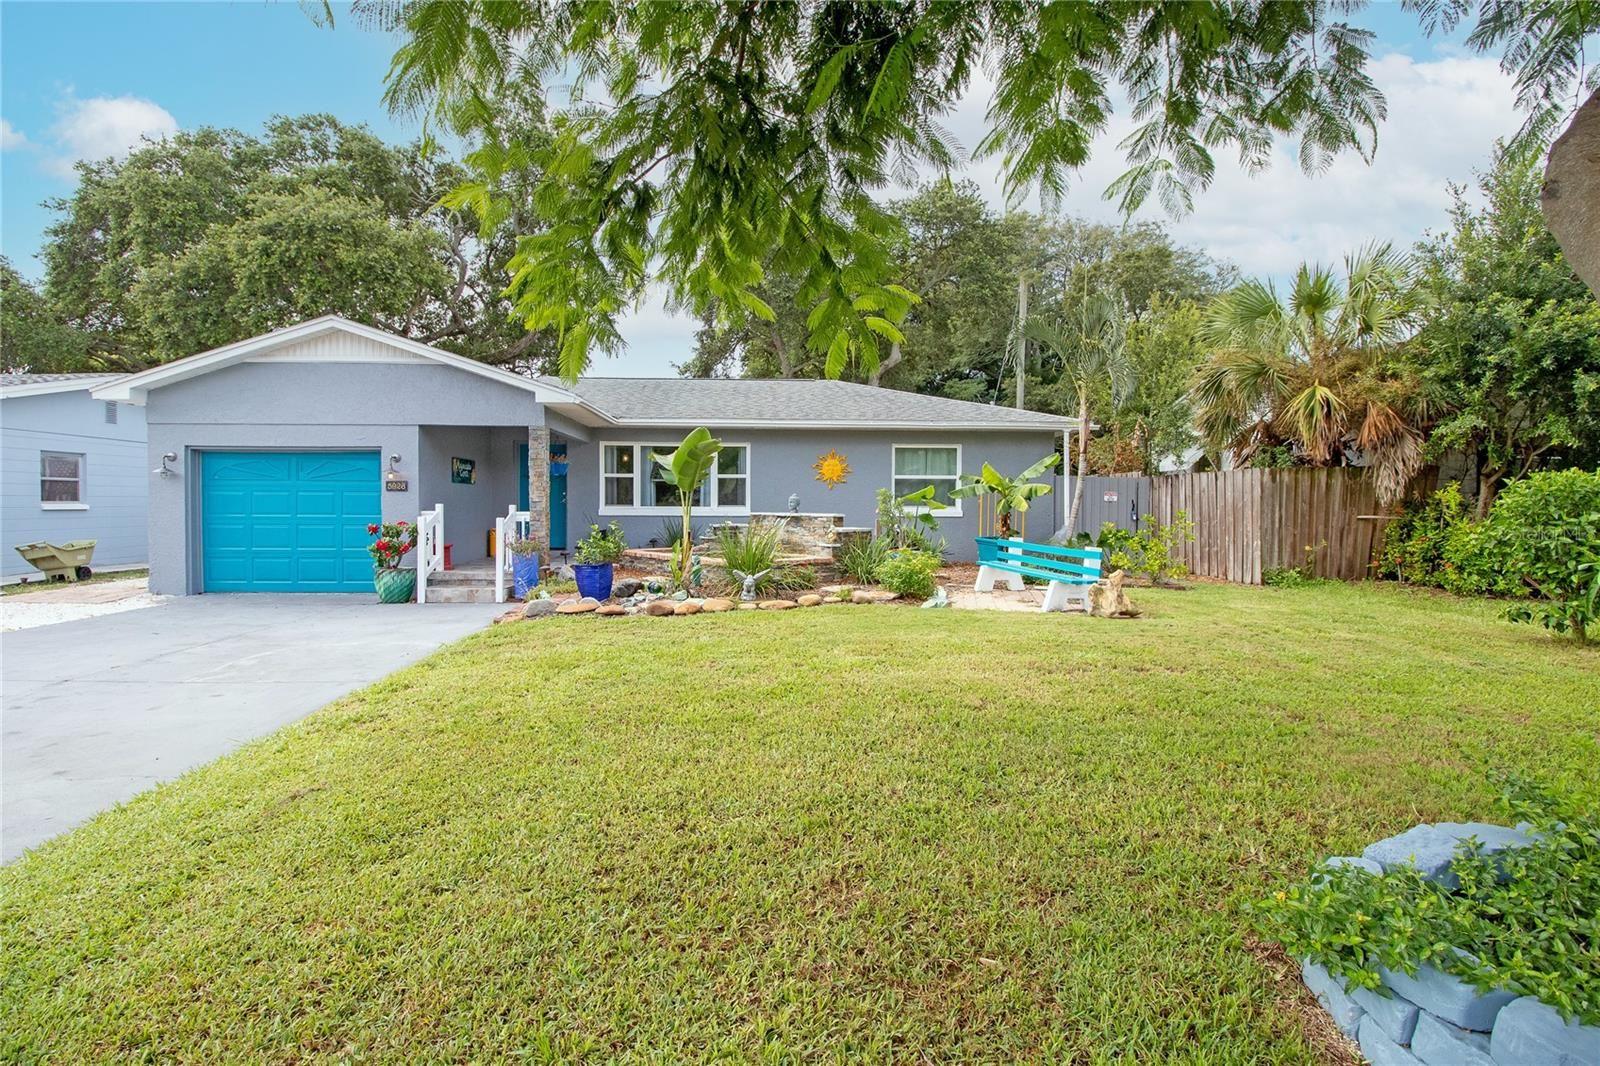 5926 TANGERINE AVENUE S, Gulfport, FL 33707 - #: U8132257